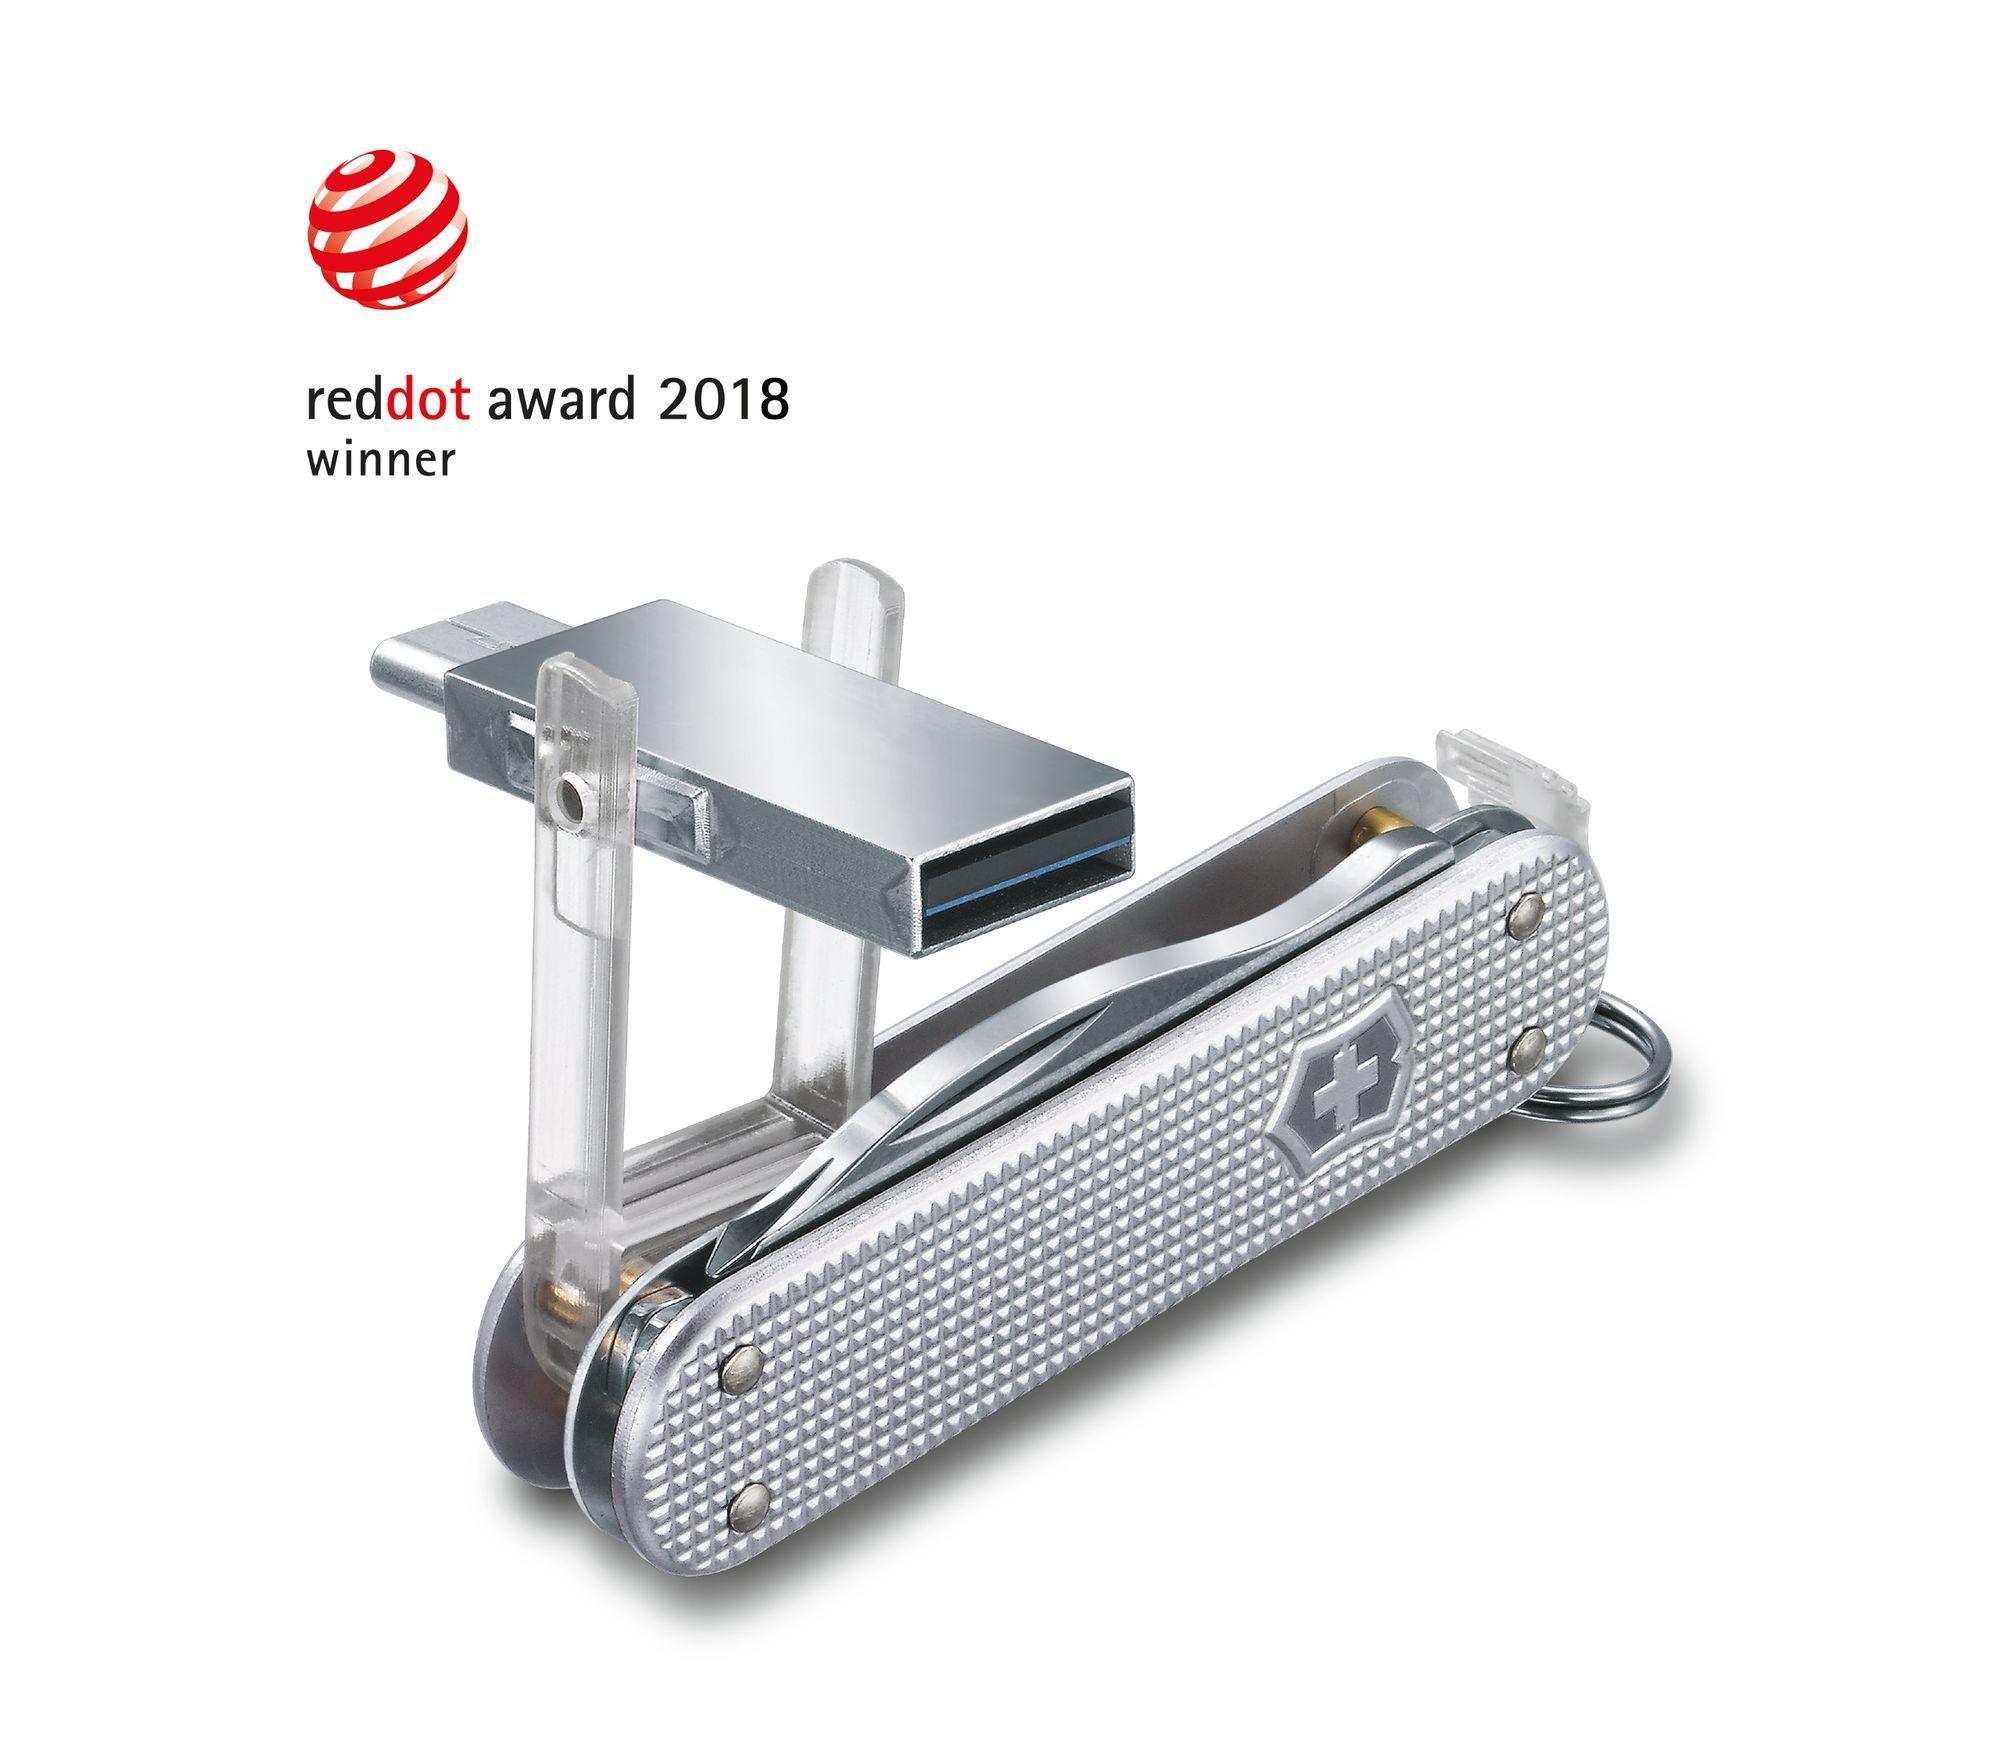 Нож-брелок Victorinox с USB-модулем Jetsetter@work (4.6261.26G16B1) 58 мм. в сложенном виде, 6 функций - Wenger-Victorinox.Ru